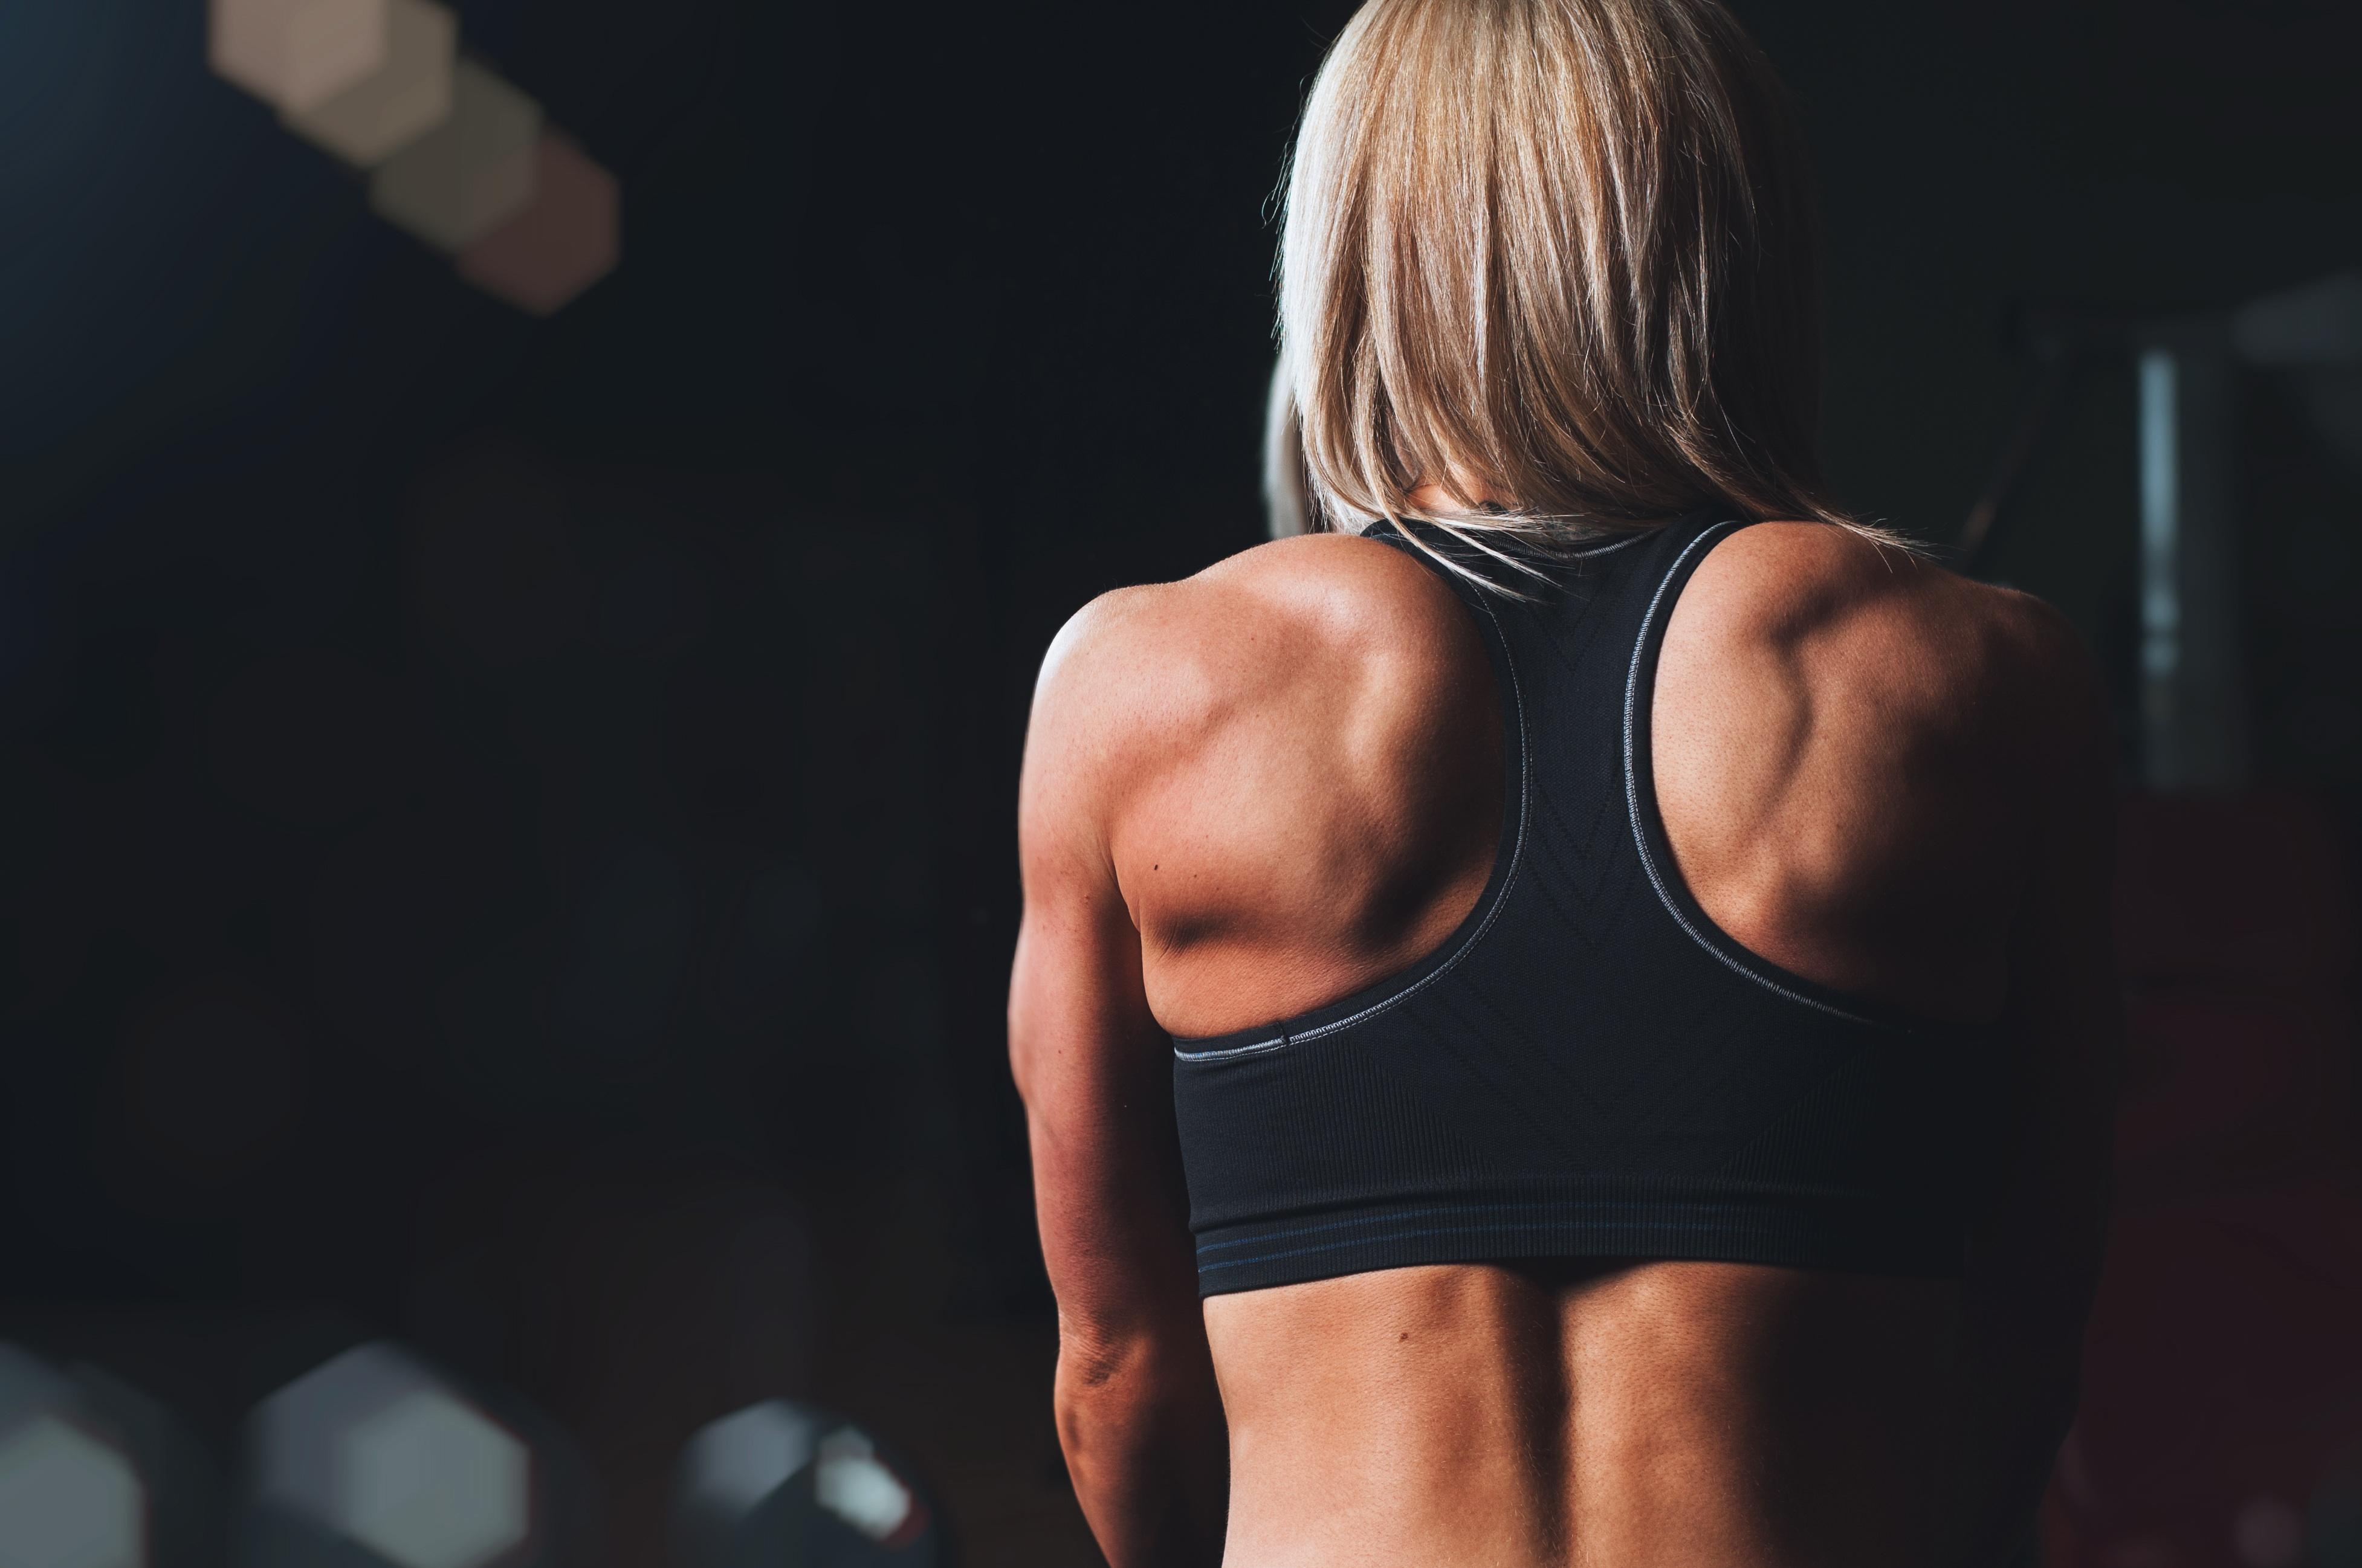 Free stock photos of fitness Pexels